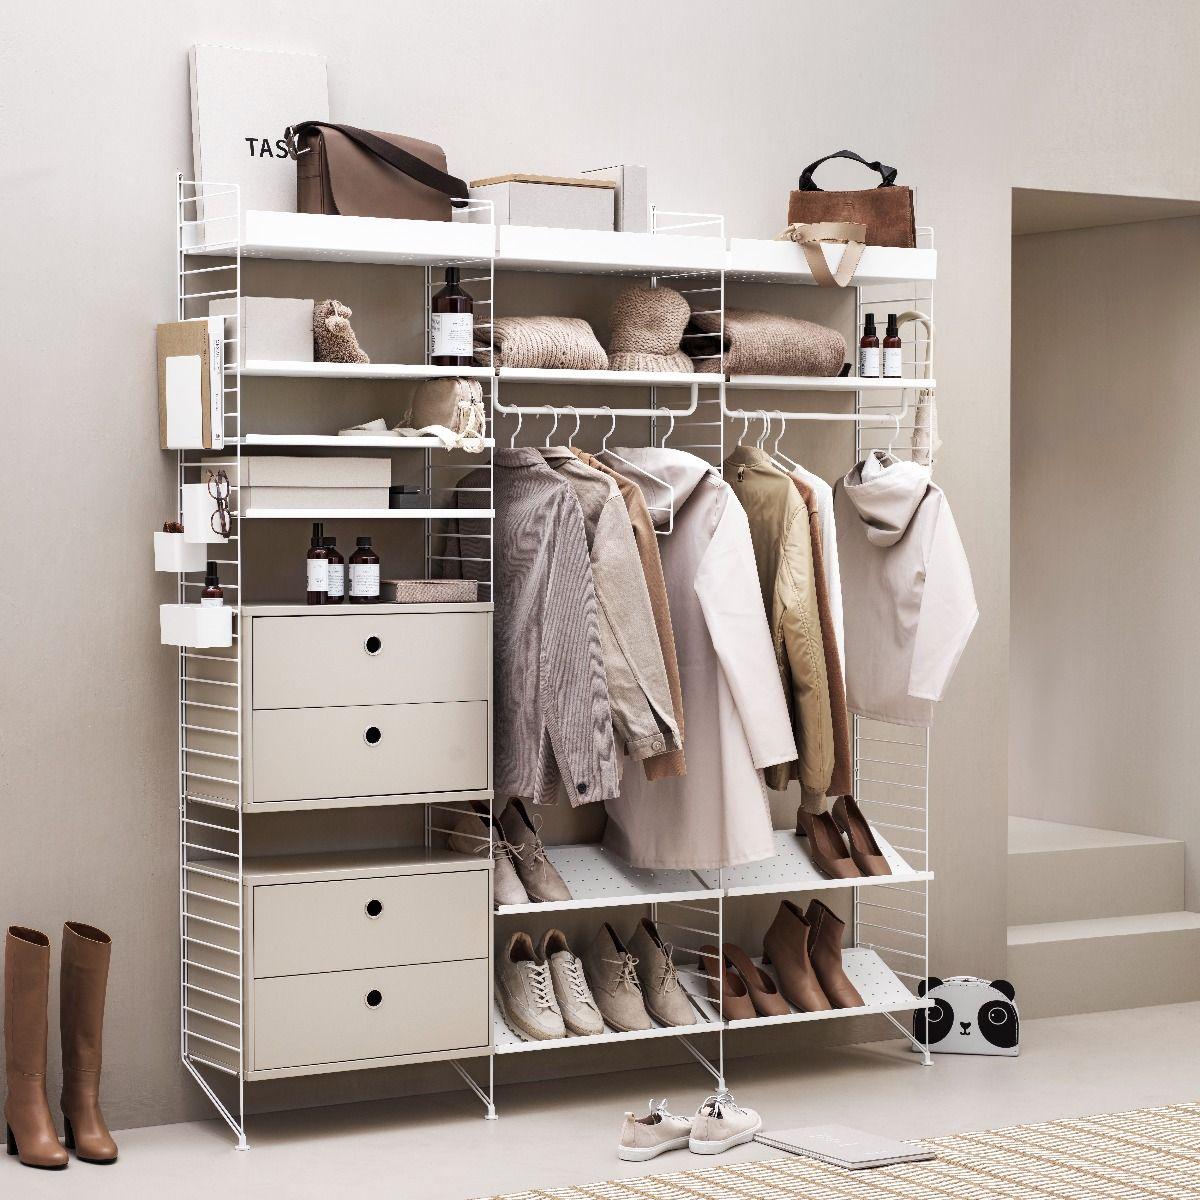 String Shoe Shelf 58 x 30cm